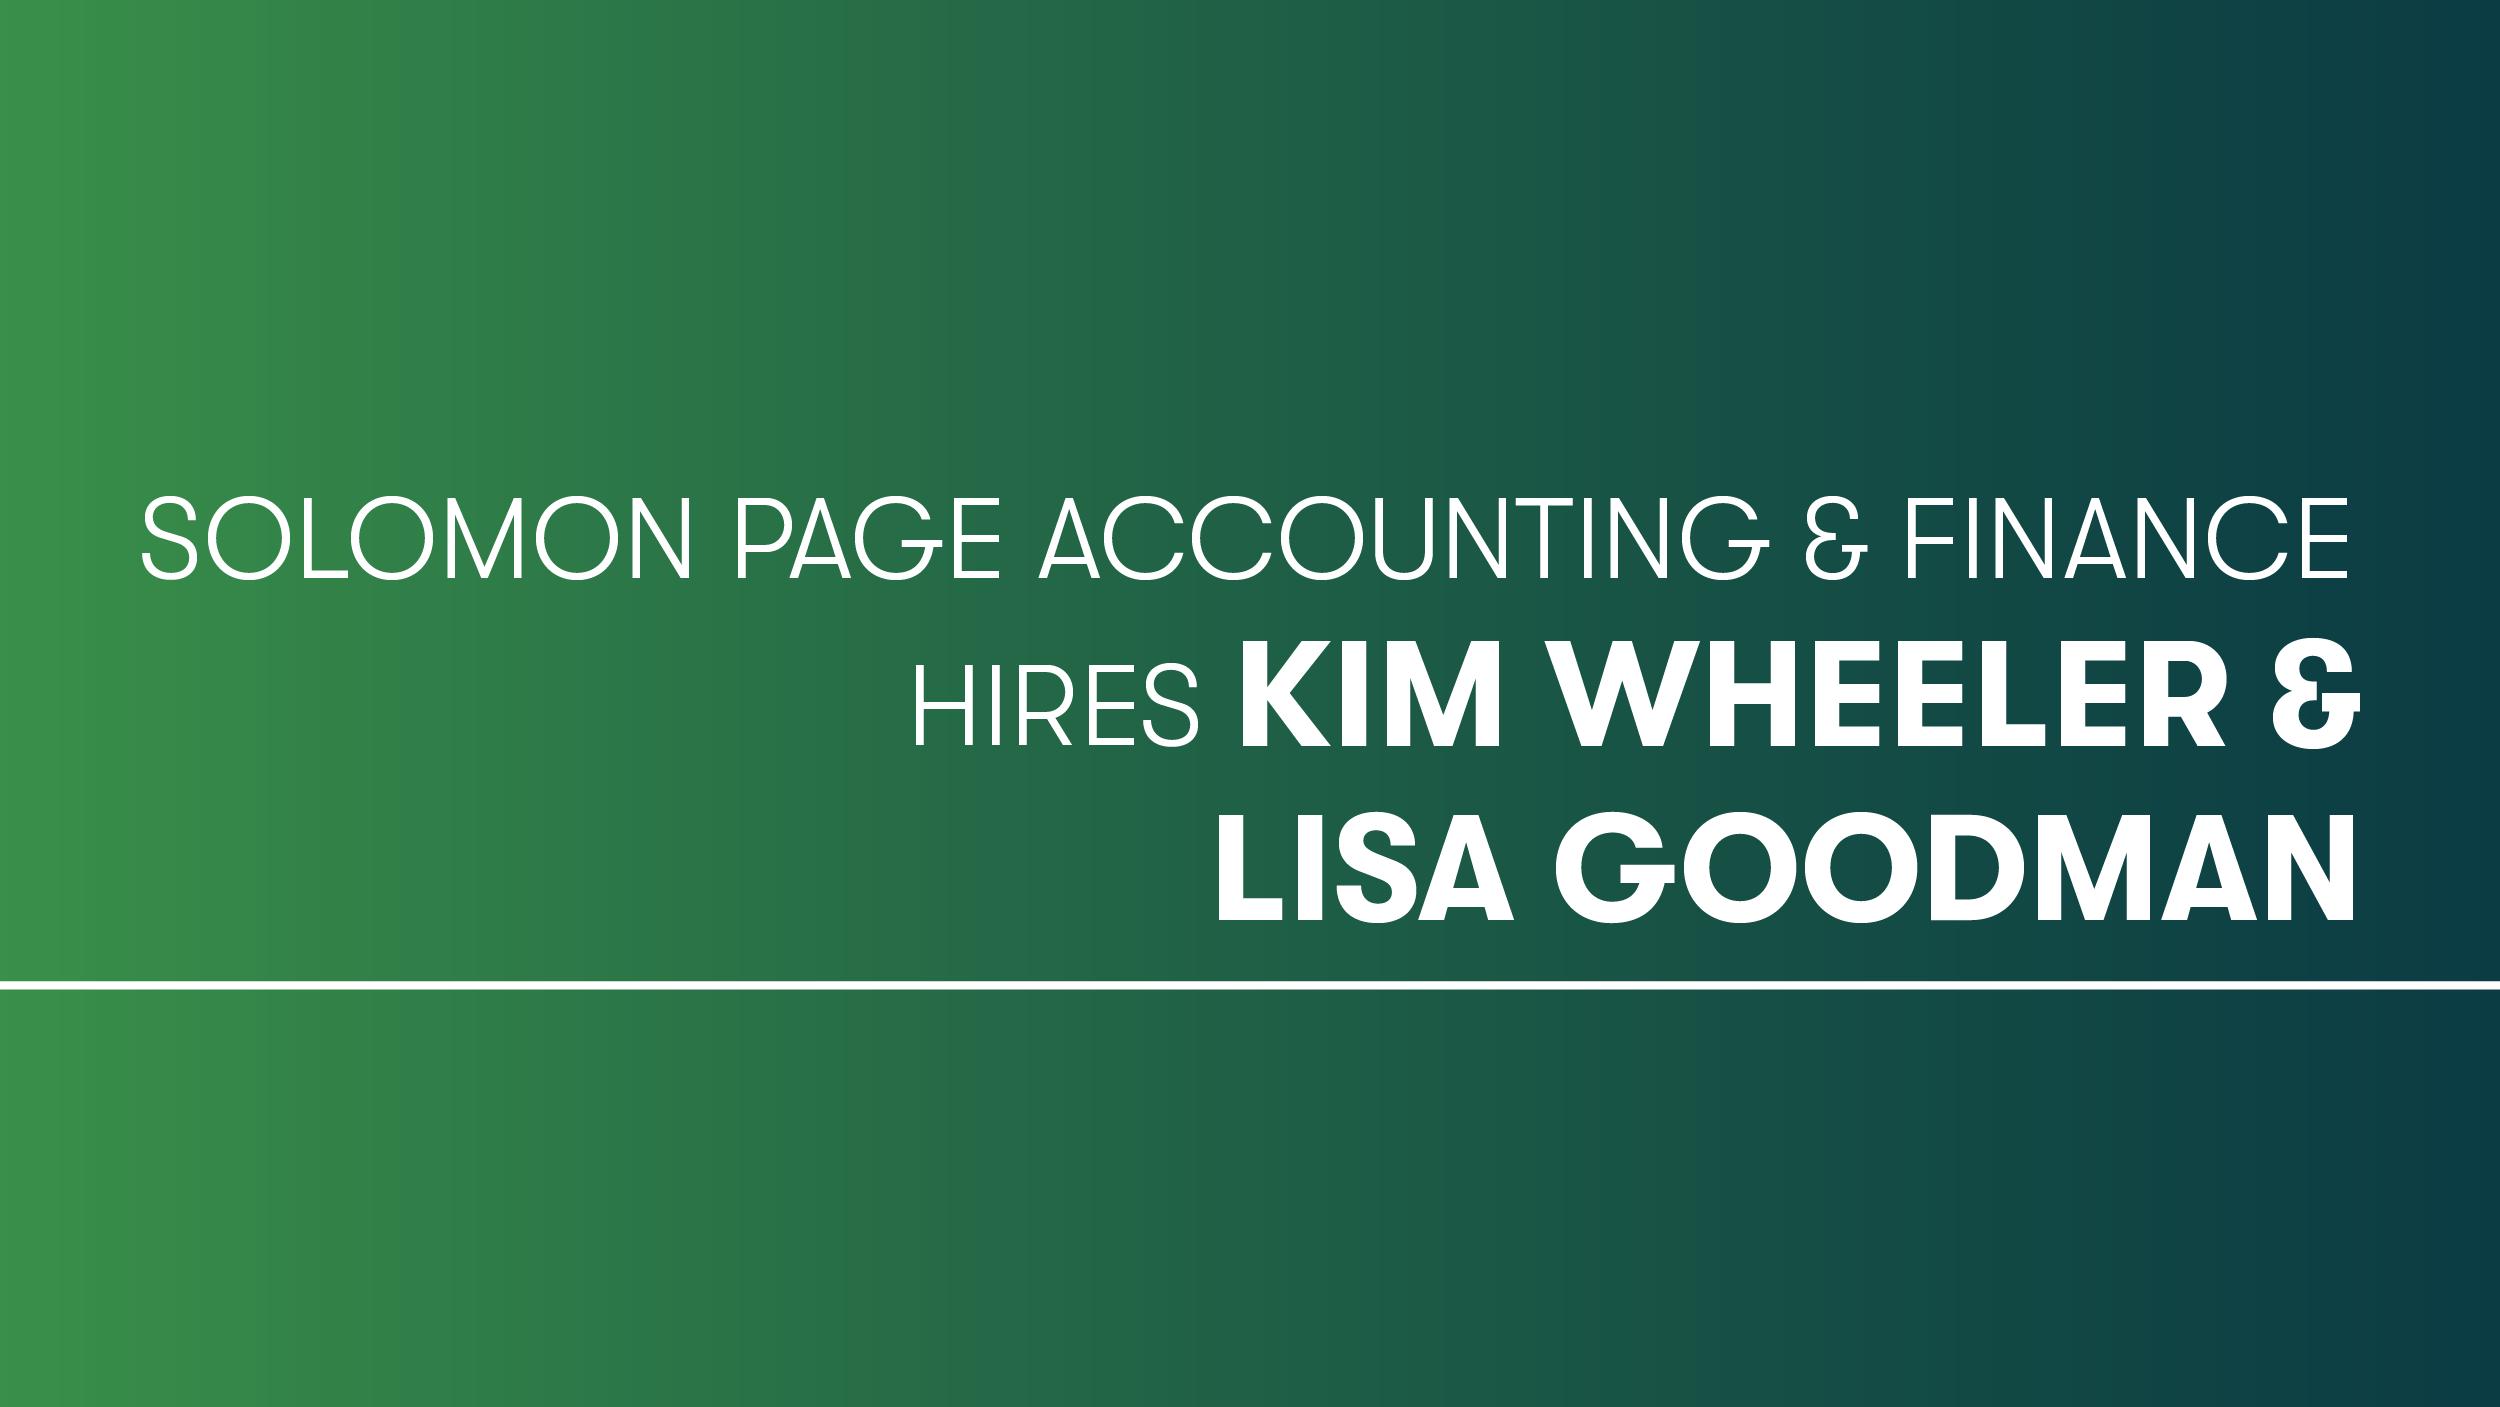 Solomon Page Accounting & Finance Hires Kim Wheeler & Lisa Goodman